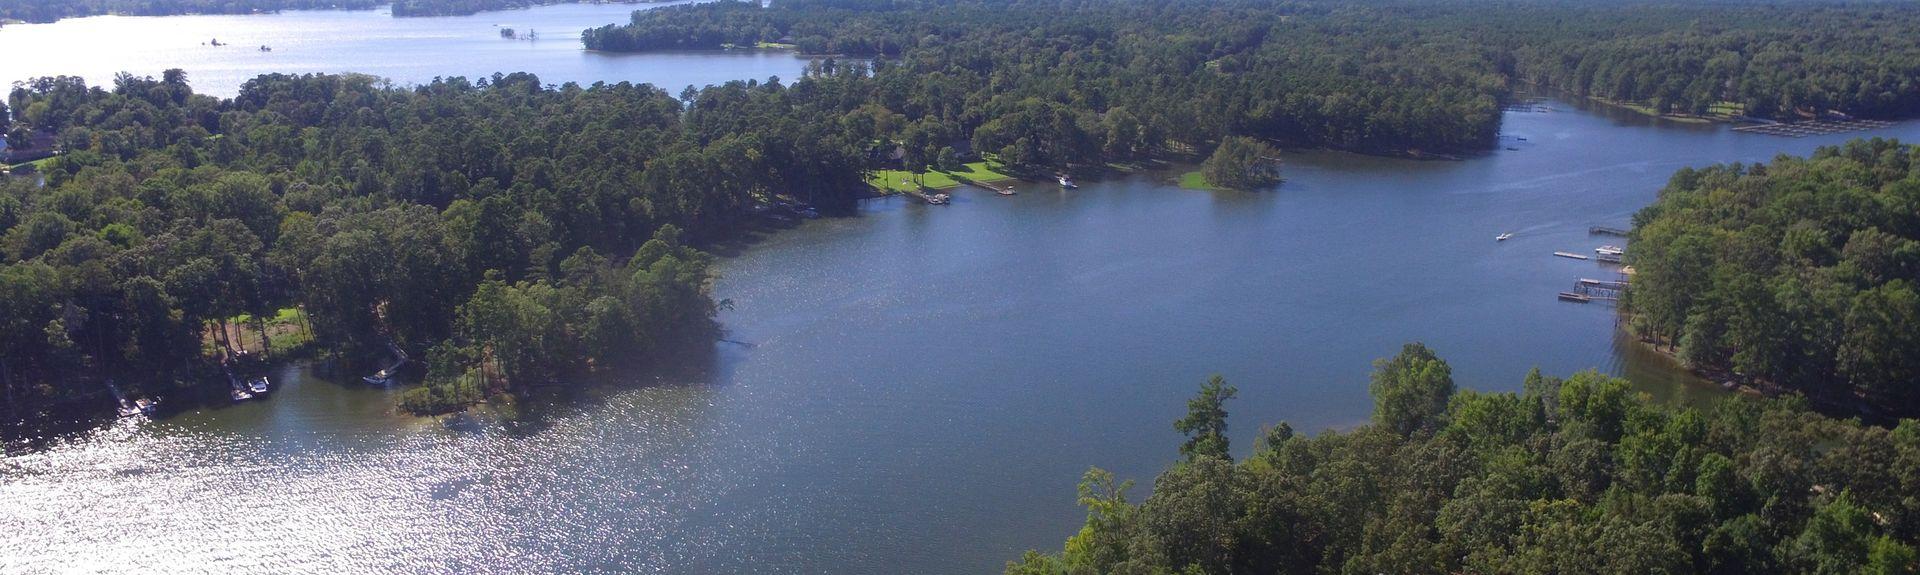 Saluda County, South Carolina, Verenigde Staten